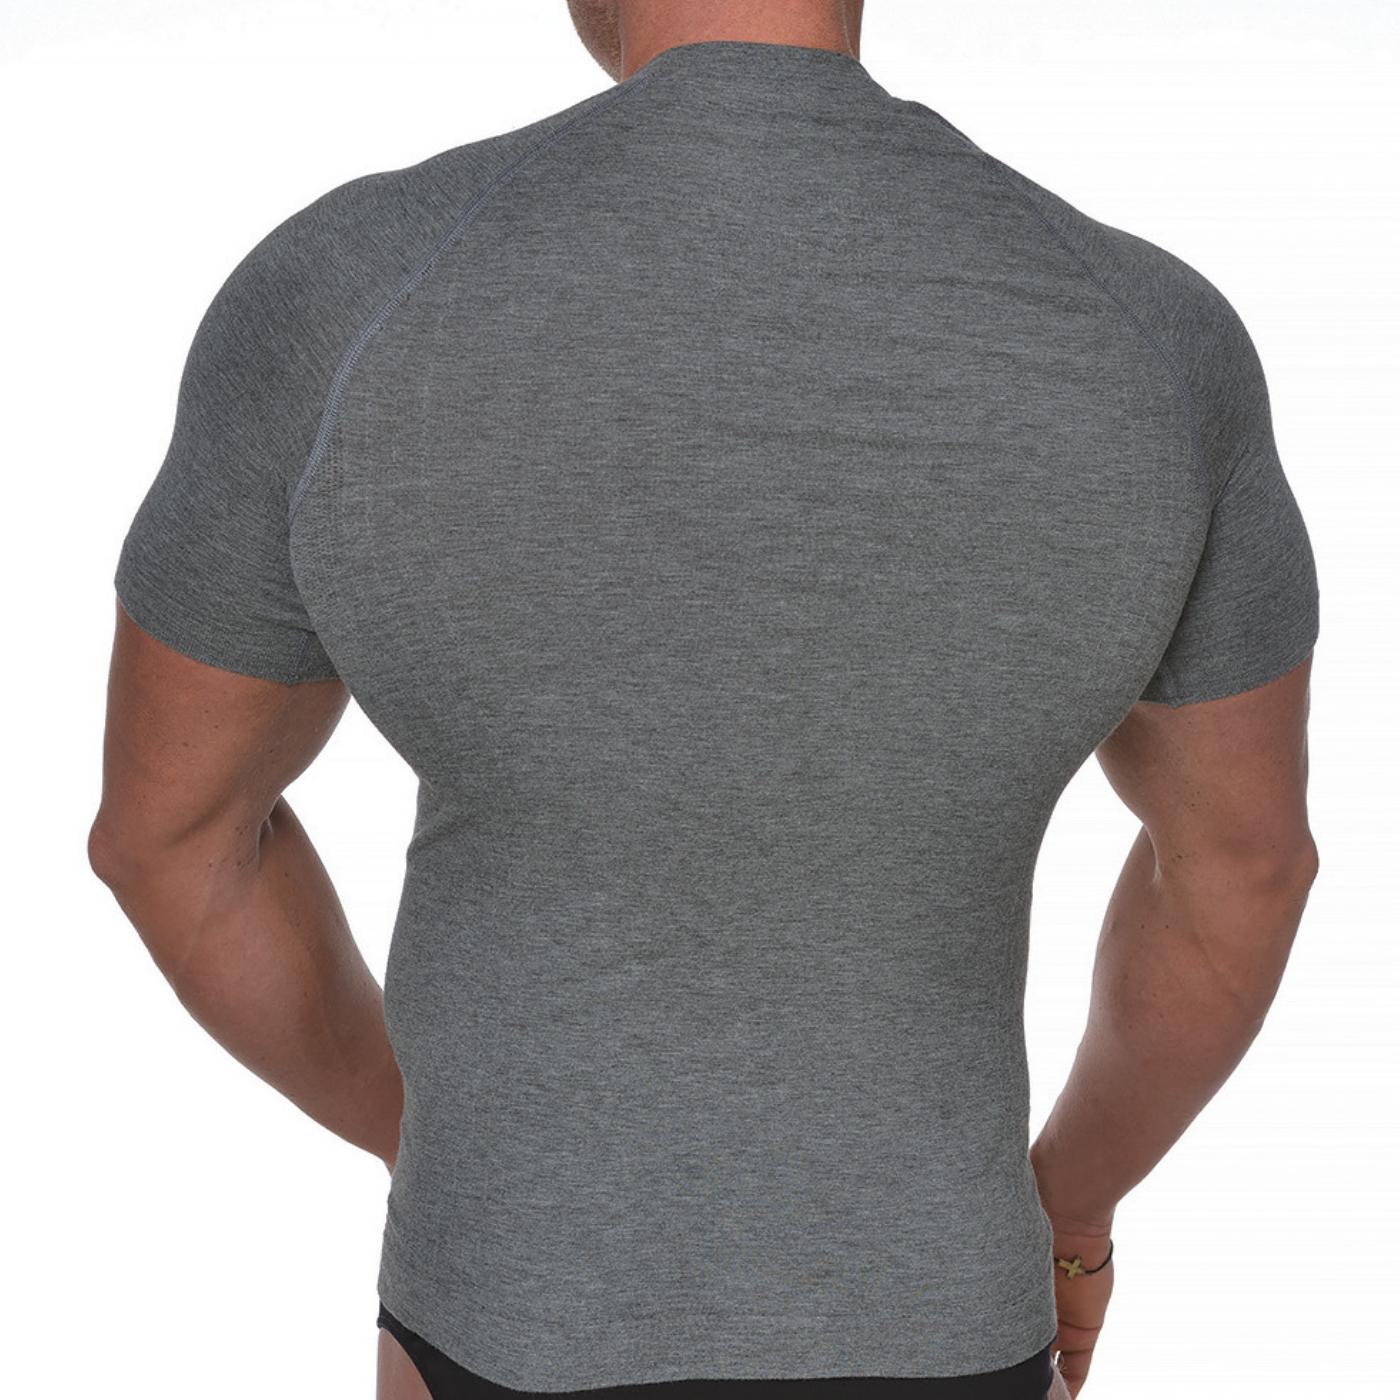 Koszulka termoaktywna typu T-Shirt FR/AS GA Flame